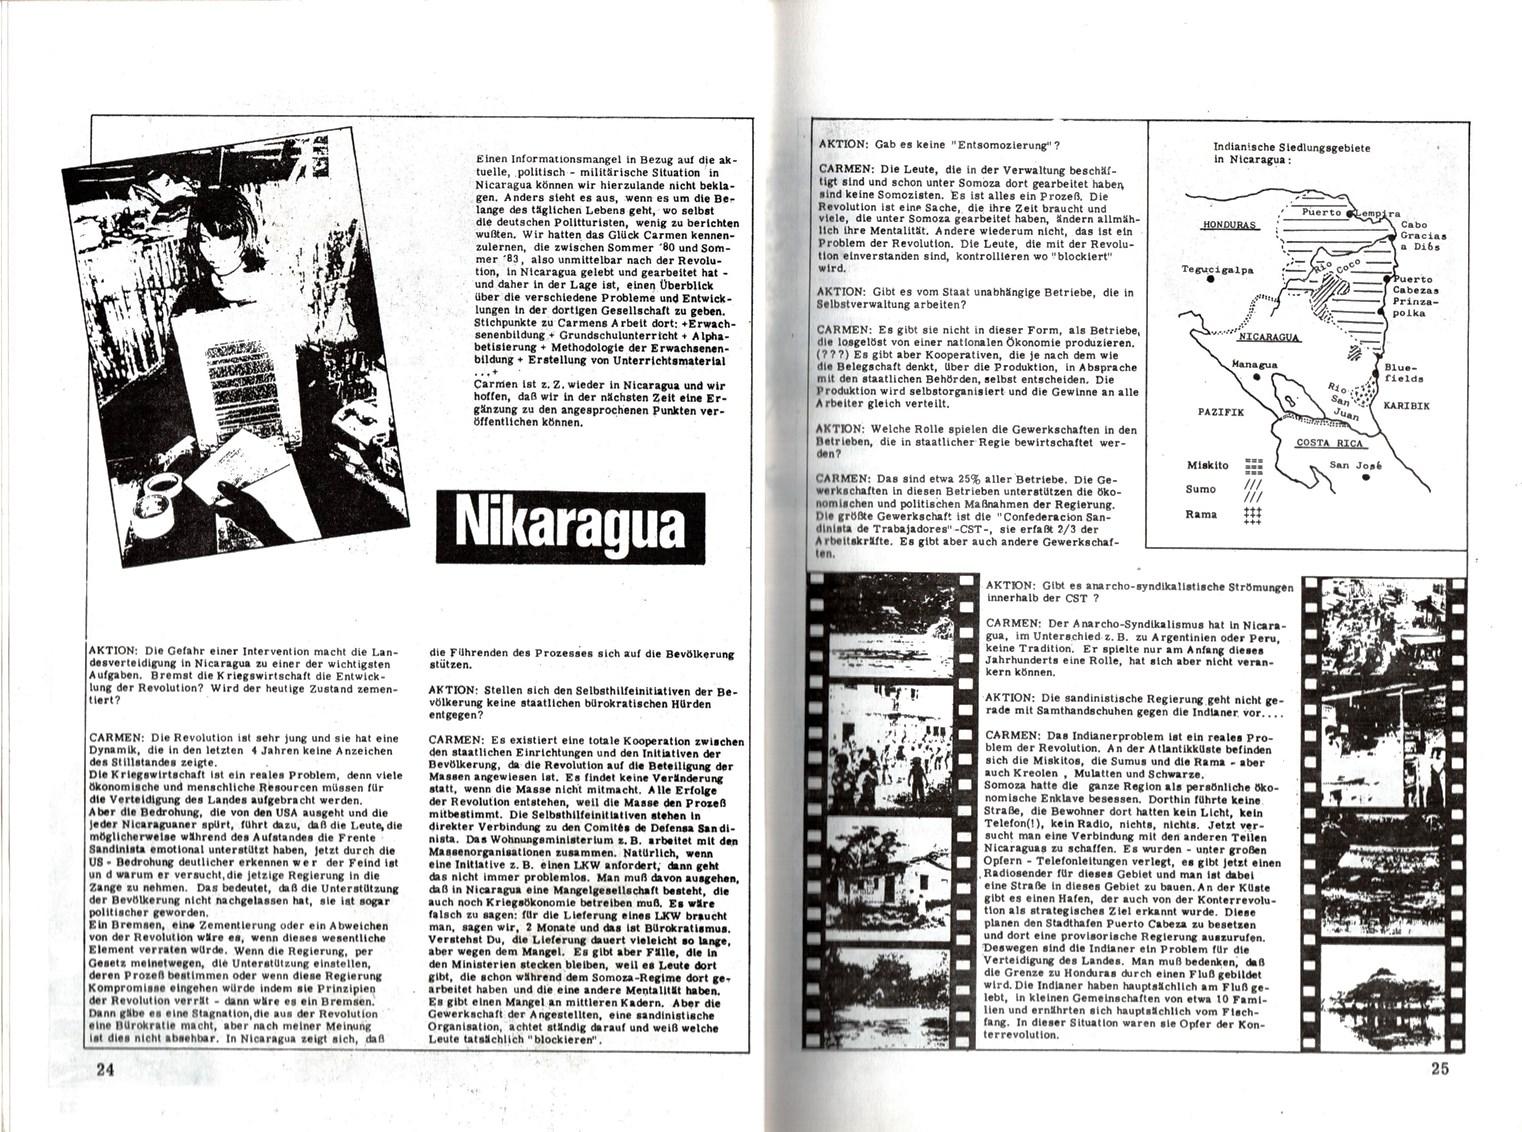 Frankfurt_Aktion_19850200_002_014